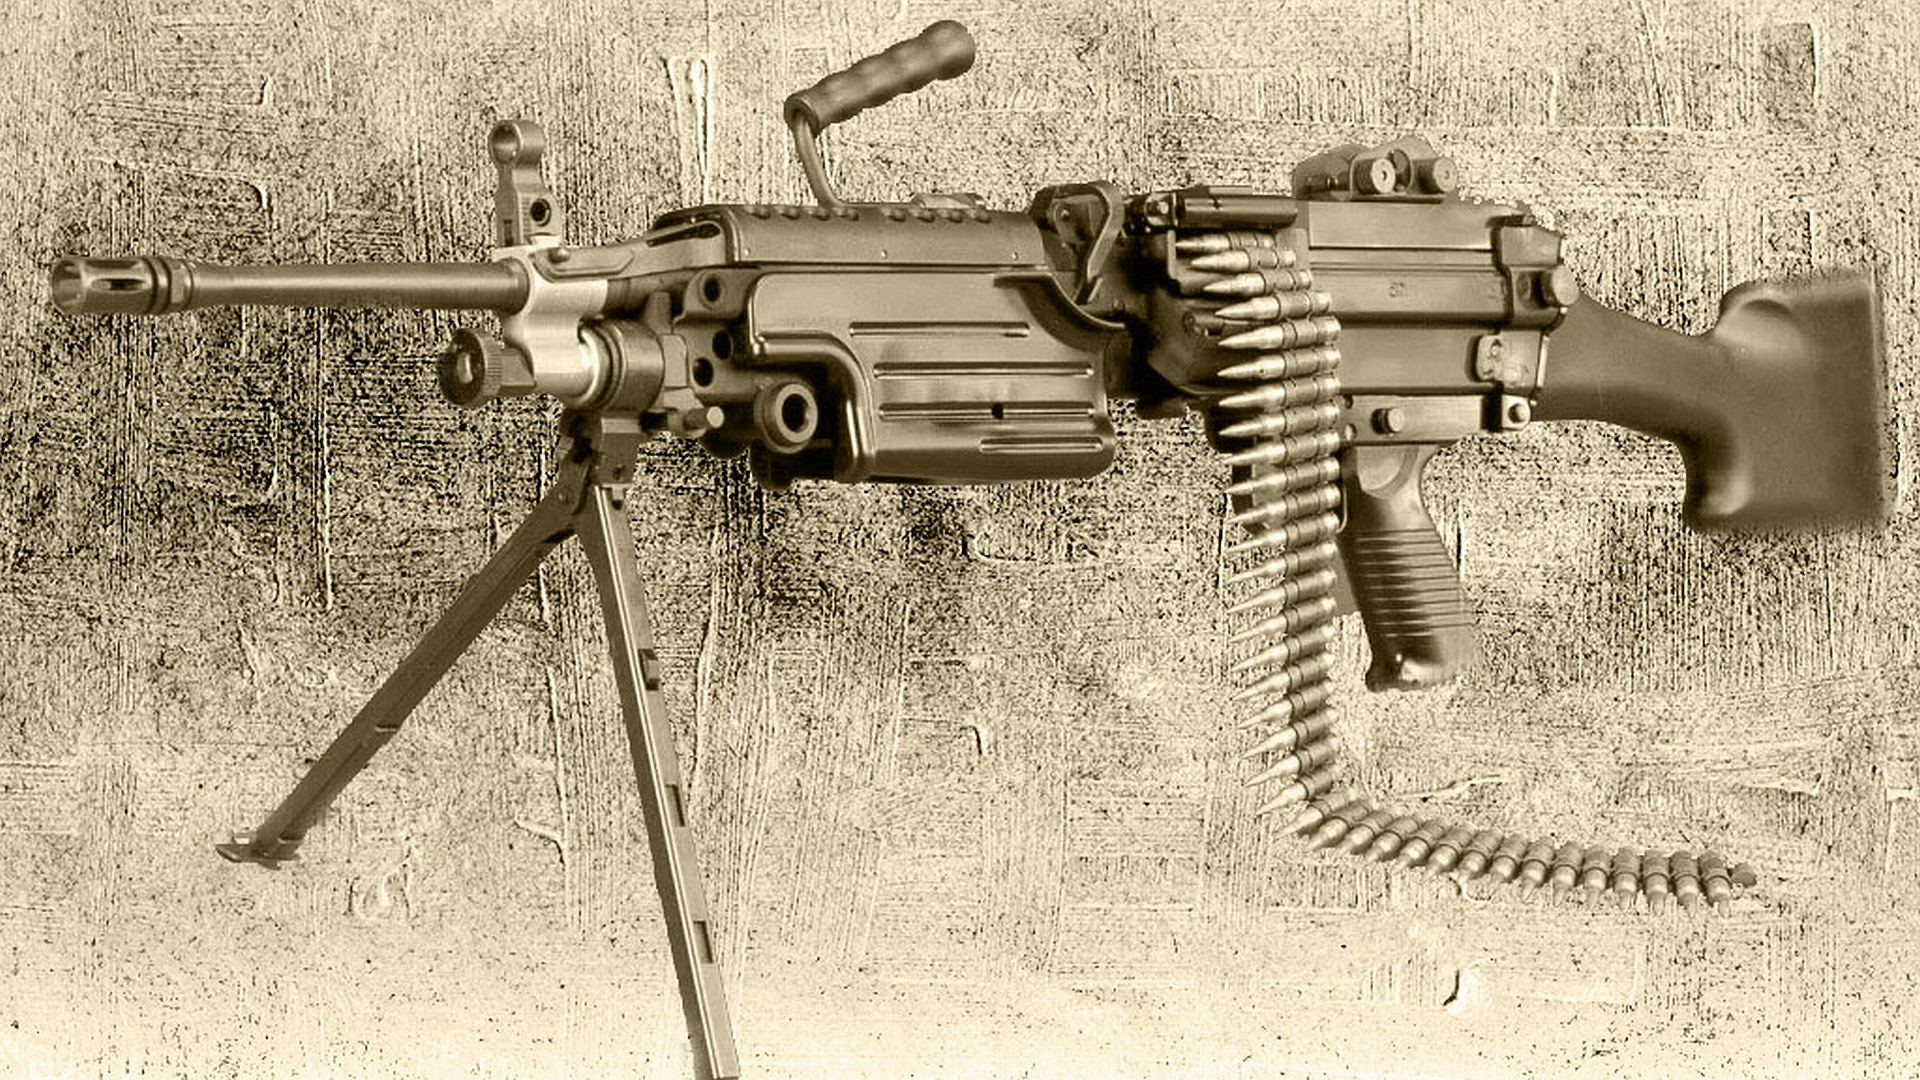 Machine Gun HD Wallpaper   Background Image   1920x1080 ...